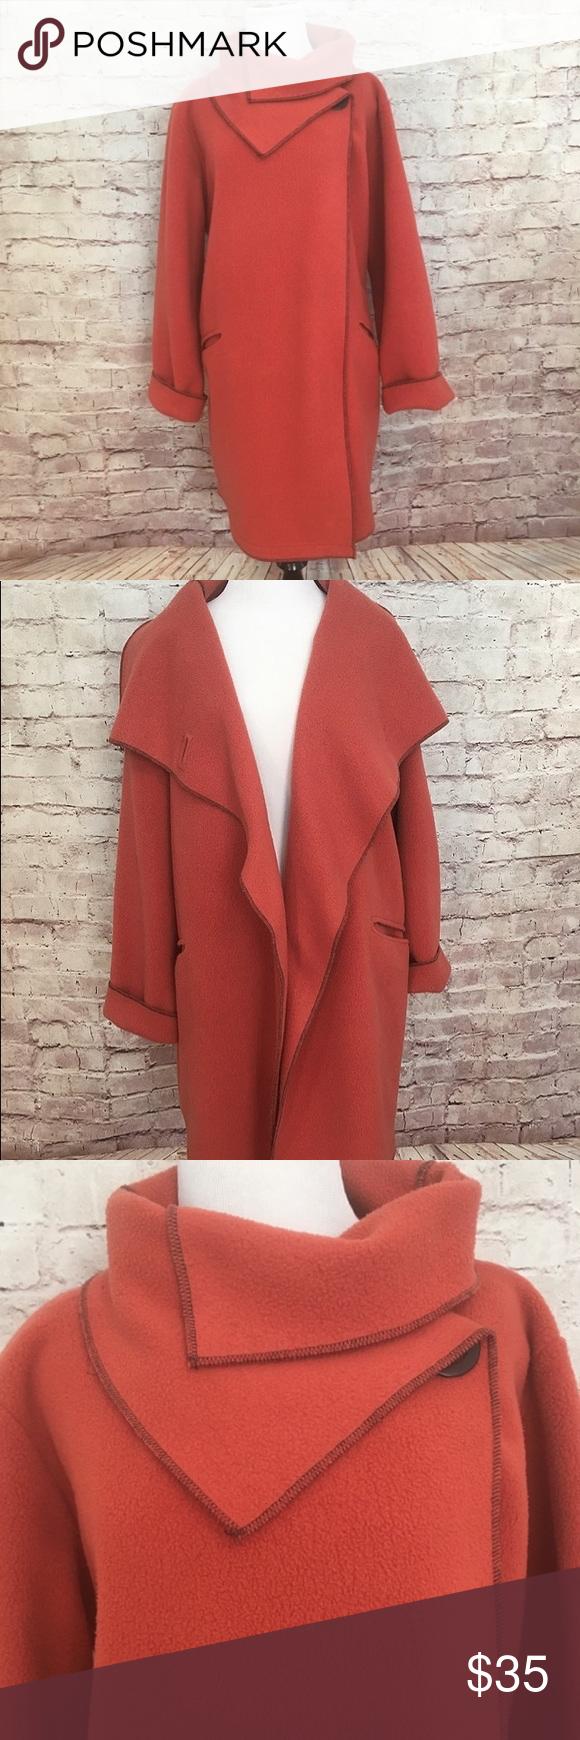 Maralyce ferree fleece coat gorgeous pumpkin colored fleece coat